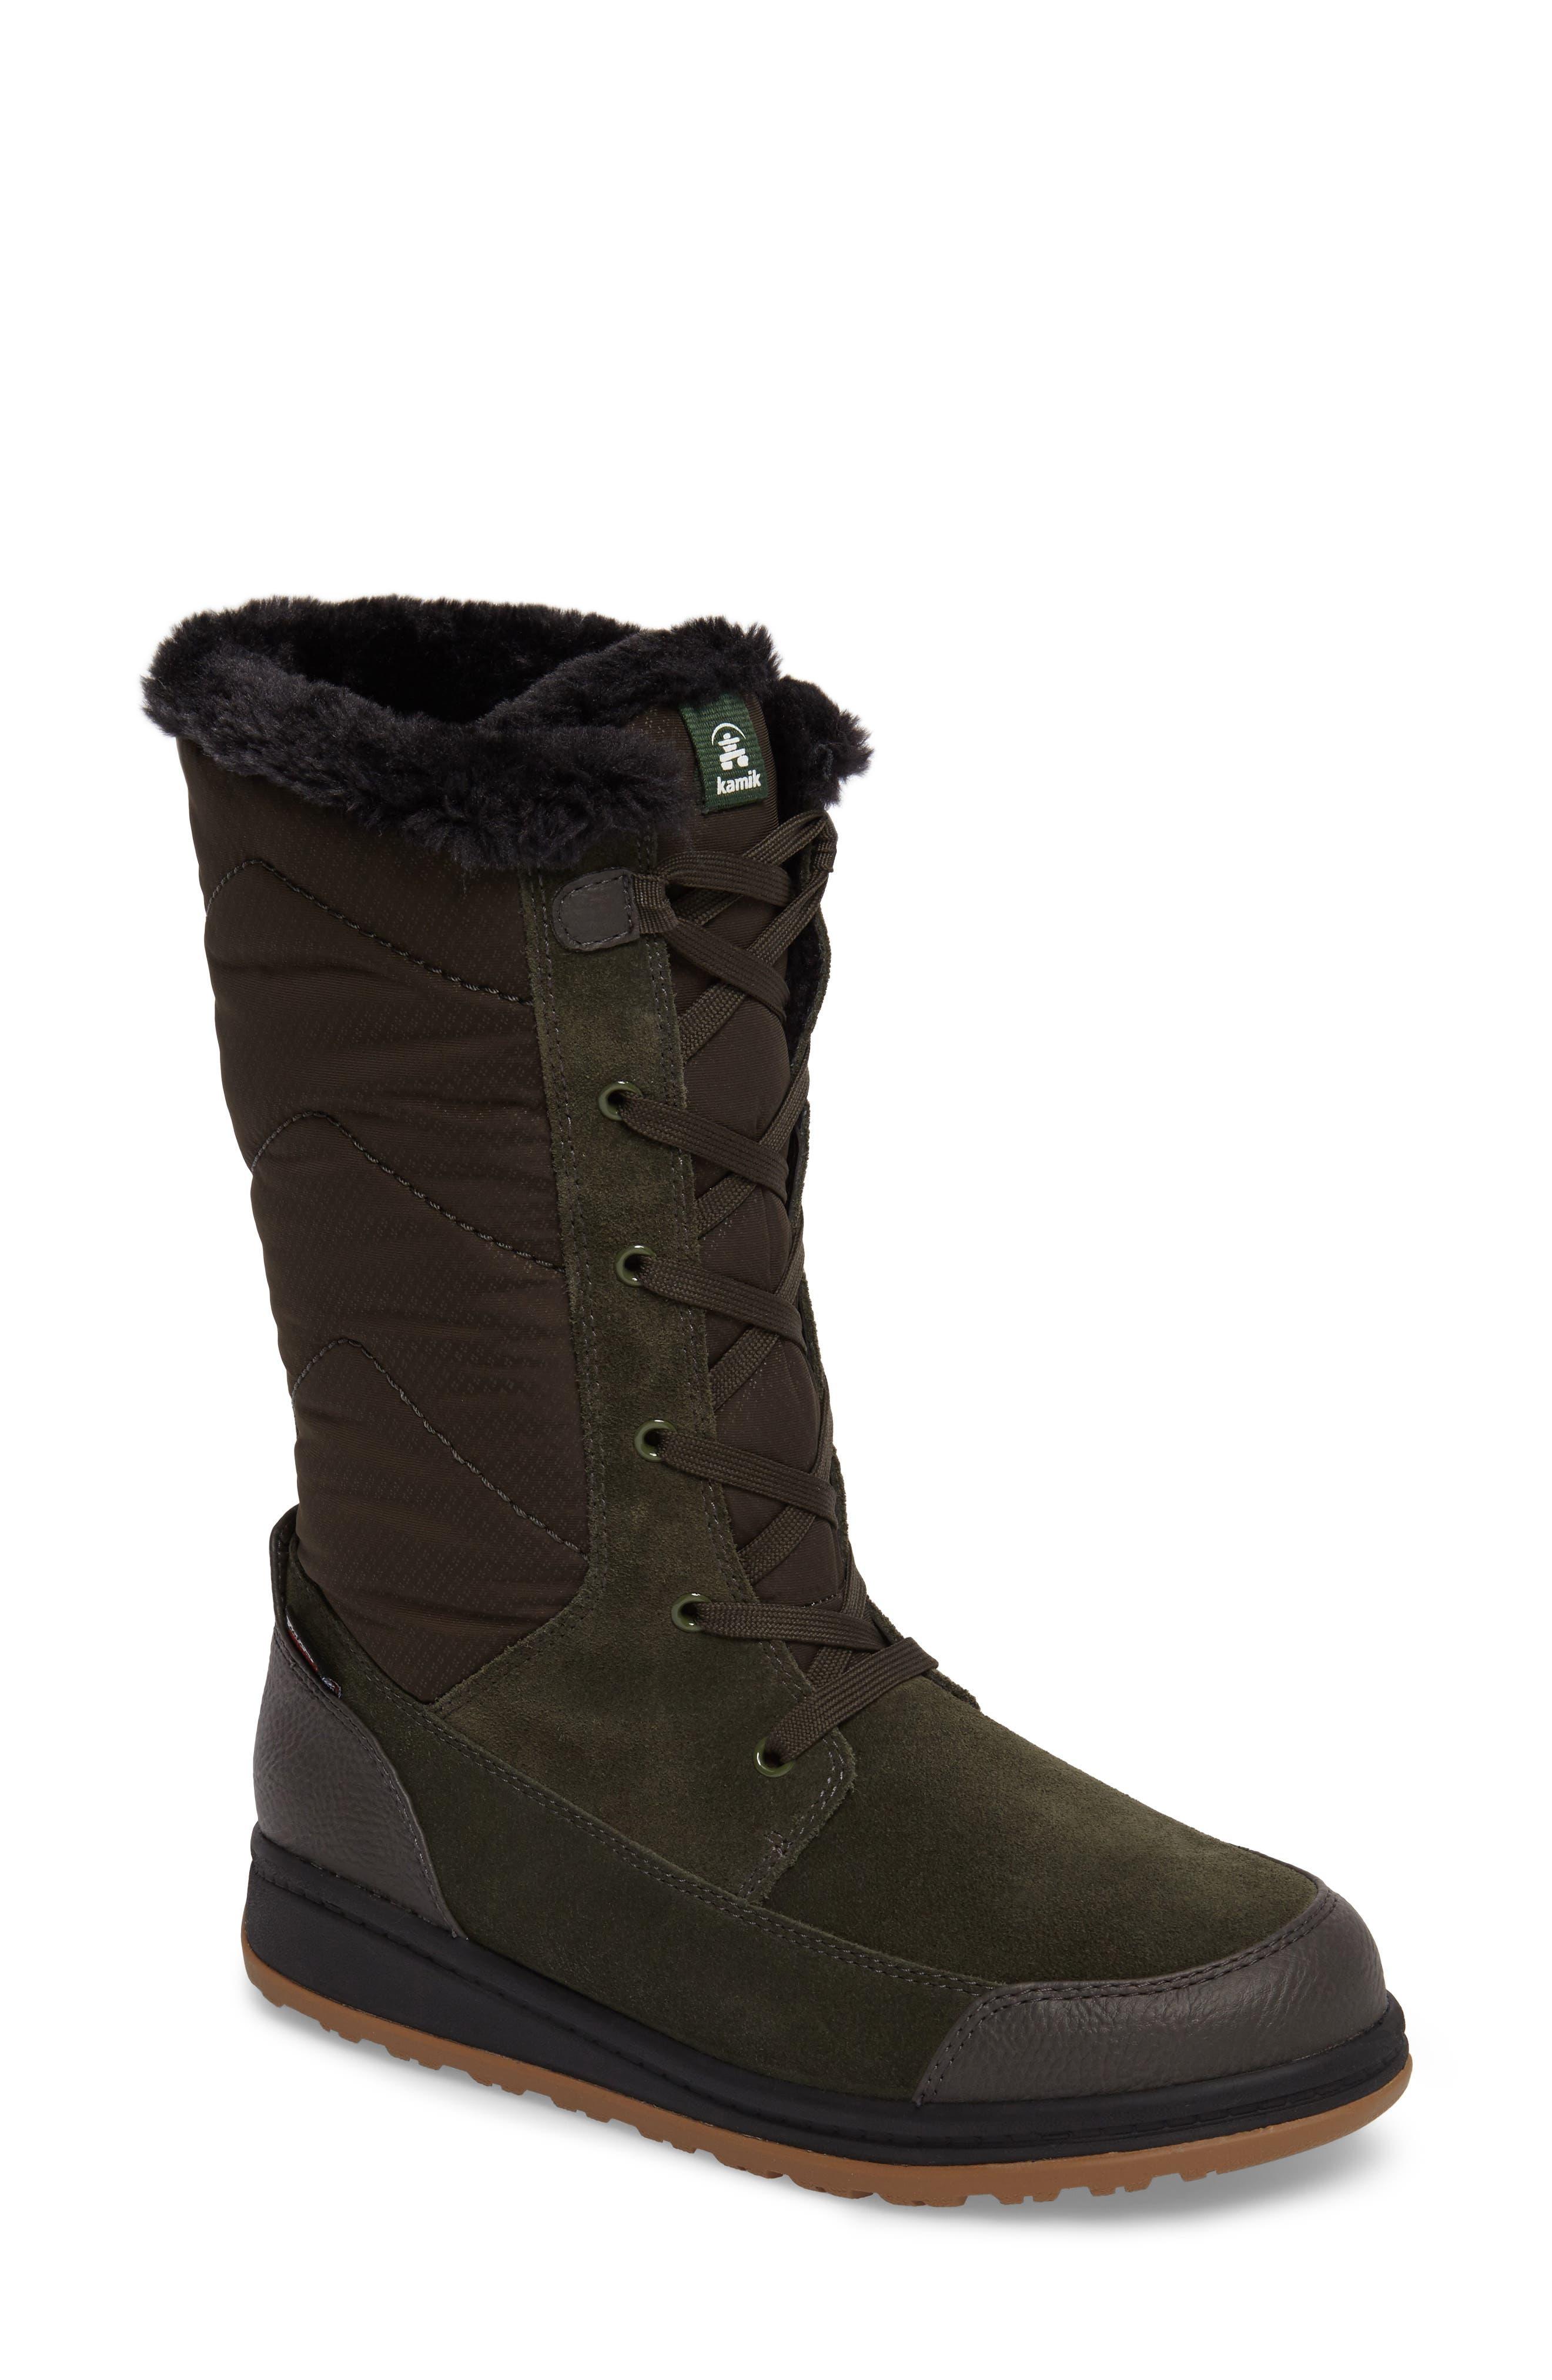 Alternate Image 1 Selected - Kamik QuincyS Waterproof Boot (Women)